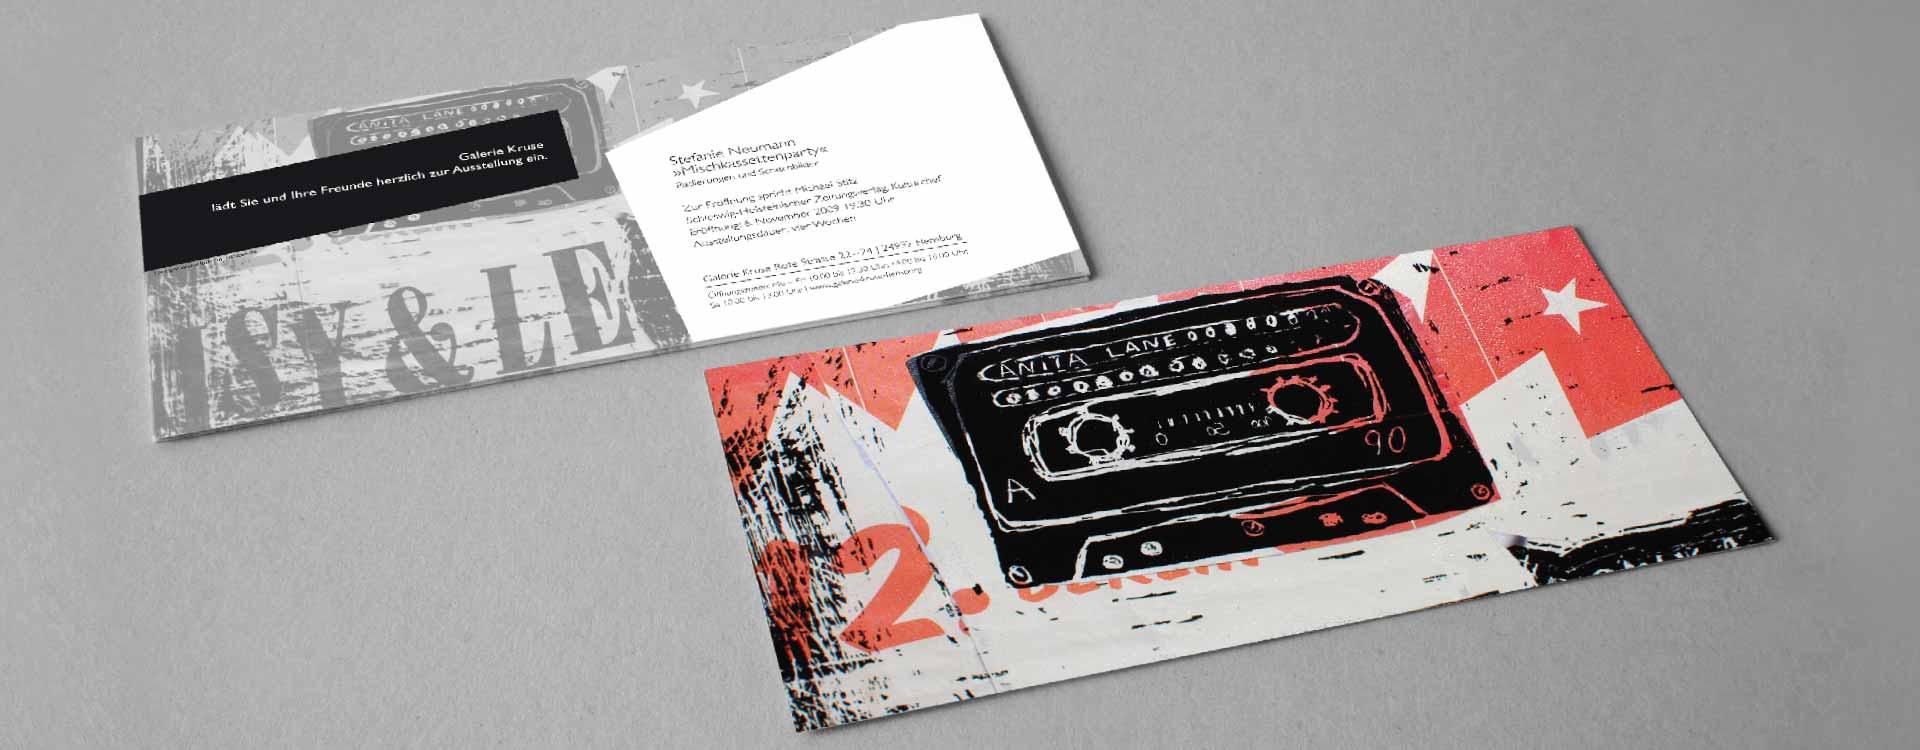 Invitation card for the solo exhibition of Stefanie Neumann in the Galerie Kruse, Flensburg; Design: Kattrin Richter | Graphic Design Studio